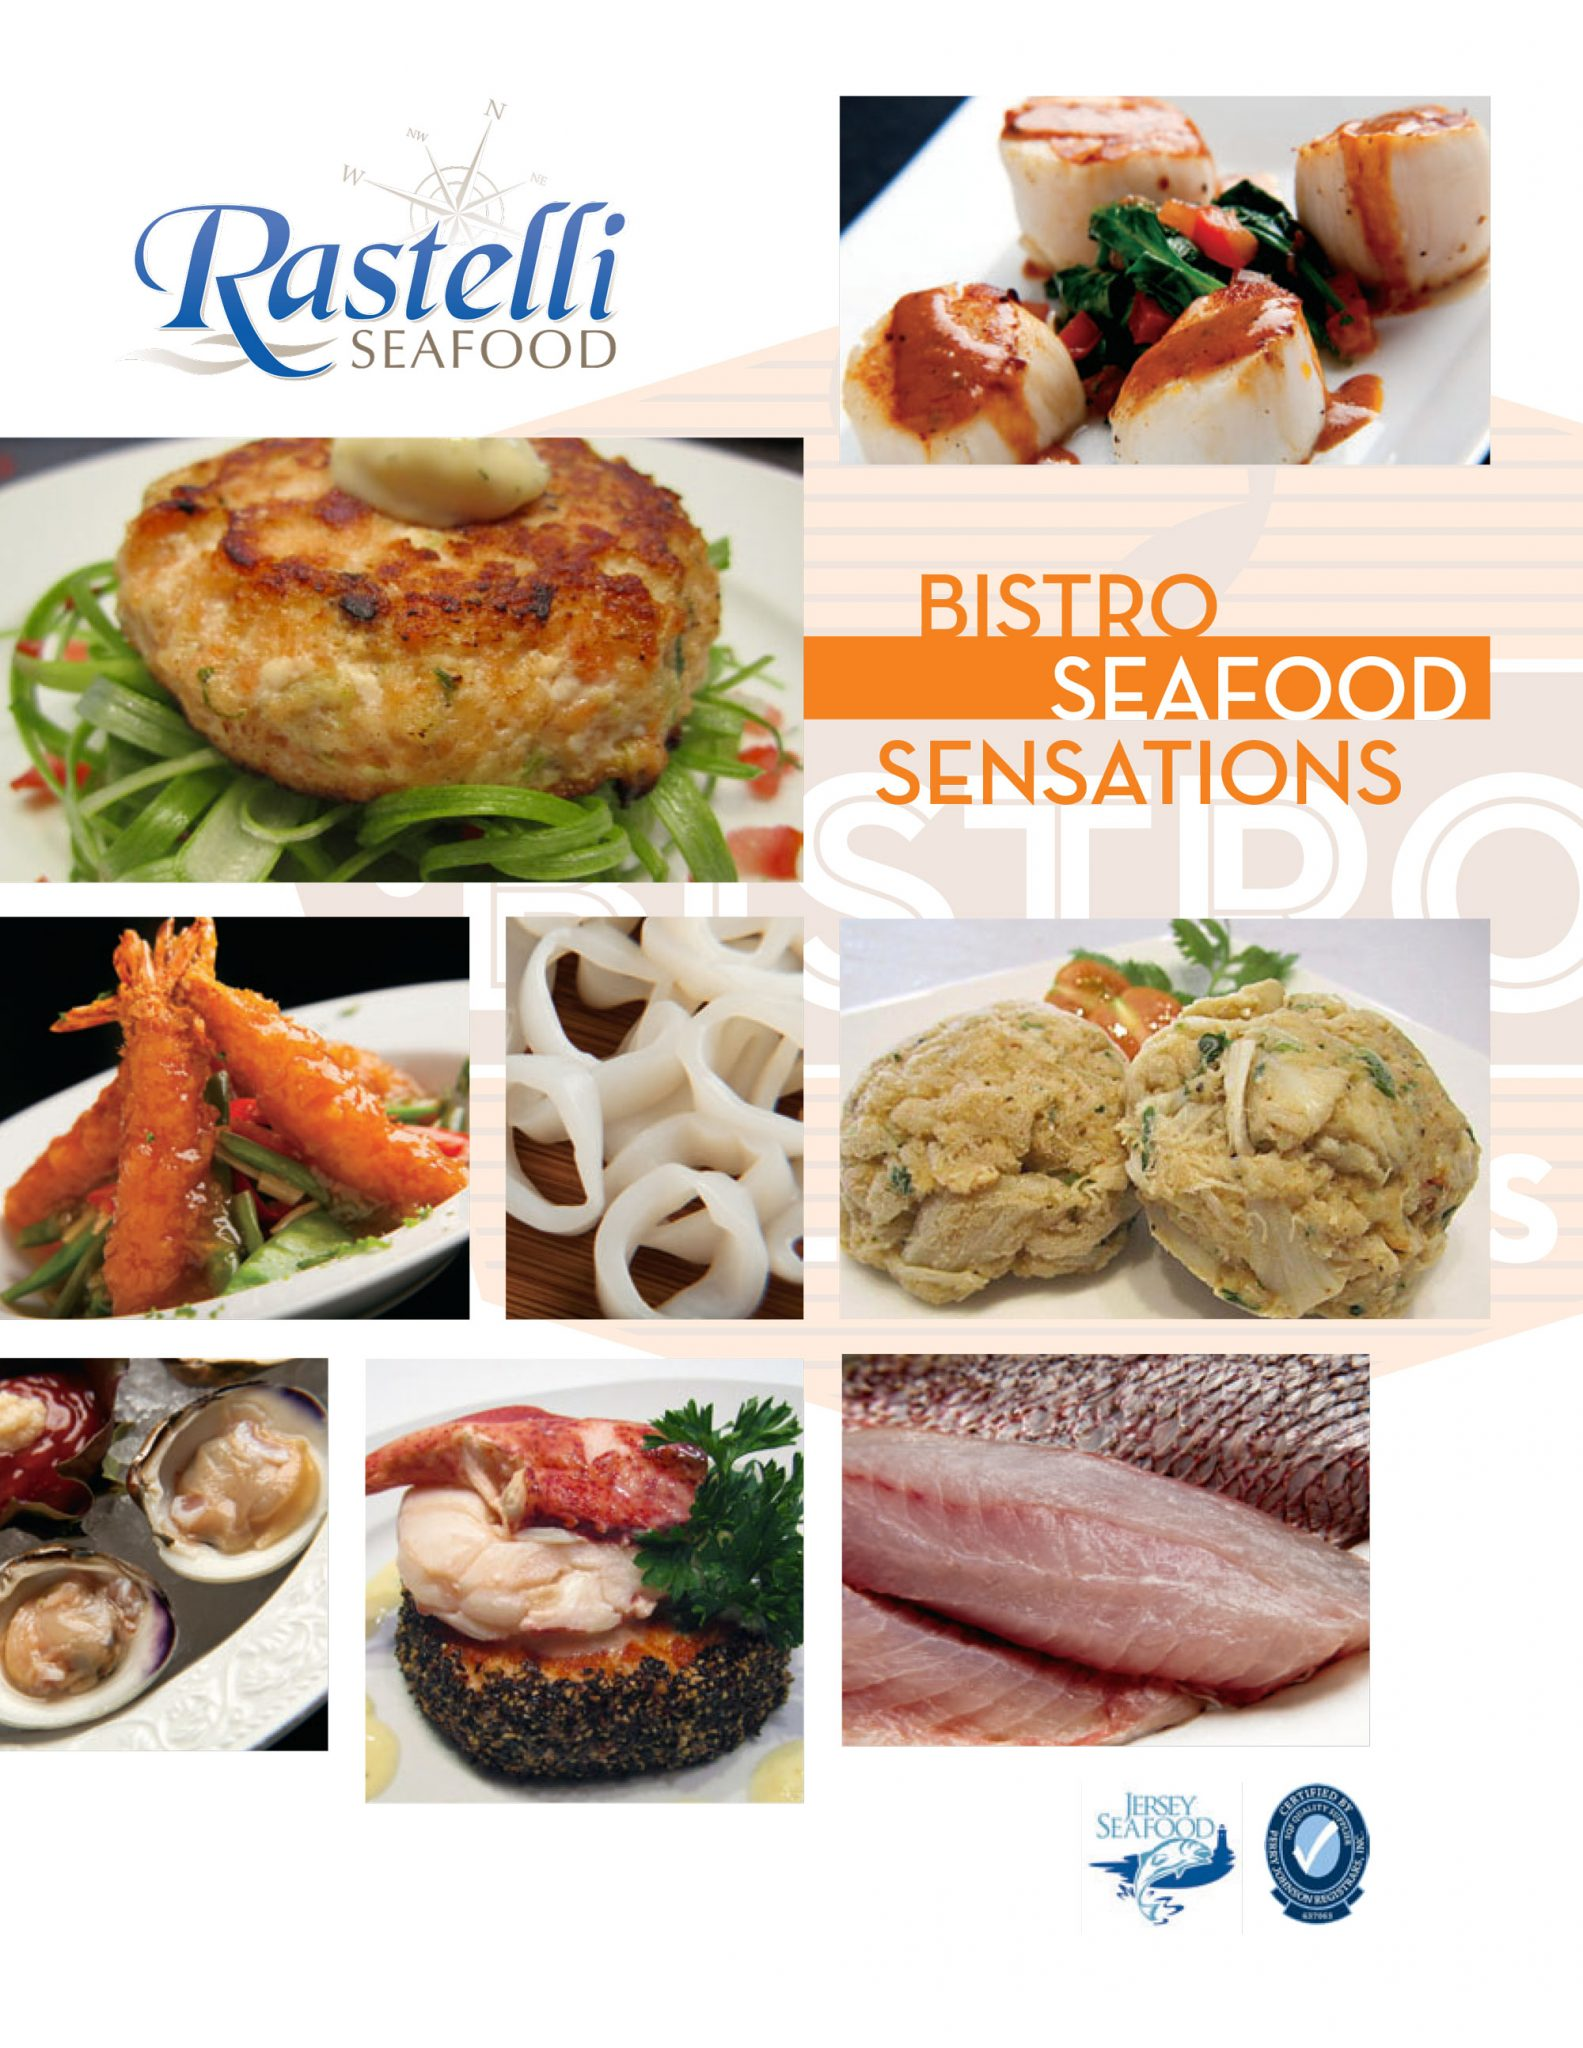 Bistro Seafood Sensations